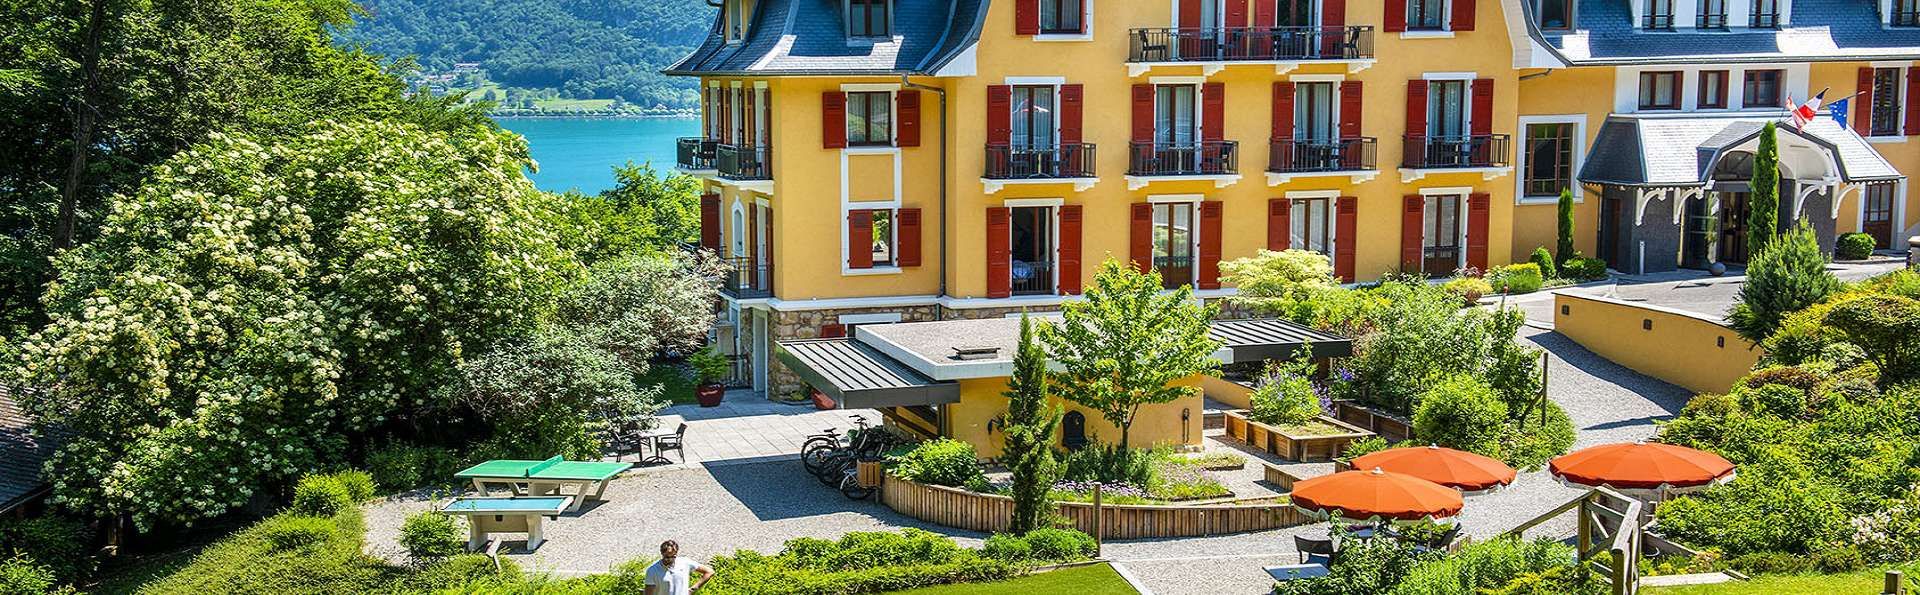 Hôtel les Trésoms Lake and Spa Resort - Annecy - Vauban-Tresoms-mai2019-054__1_.jpg